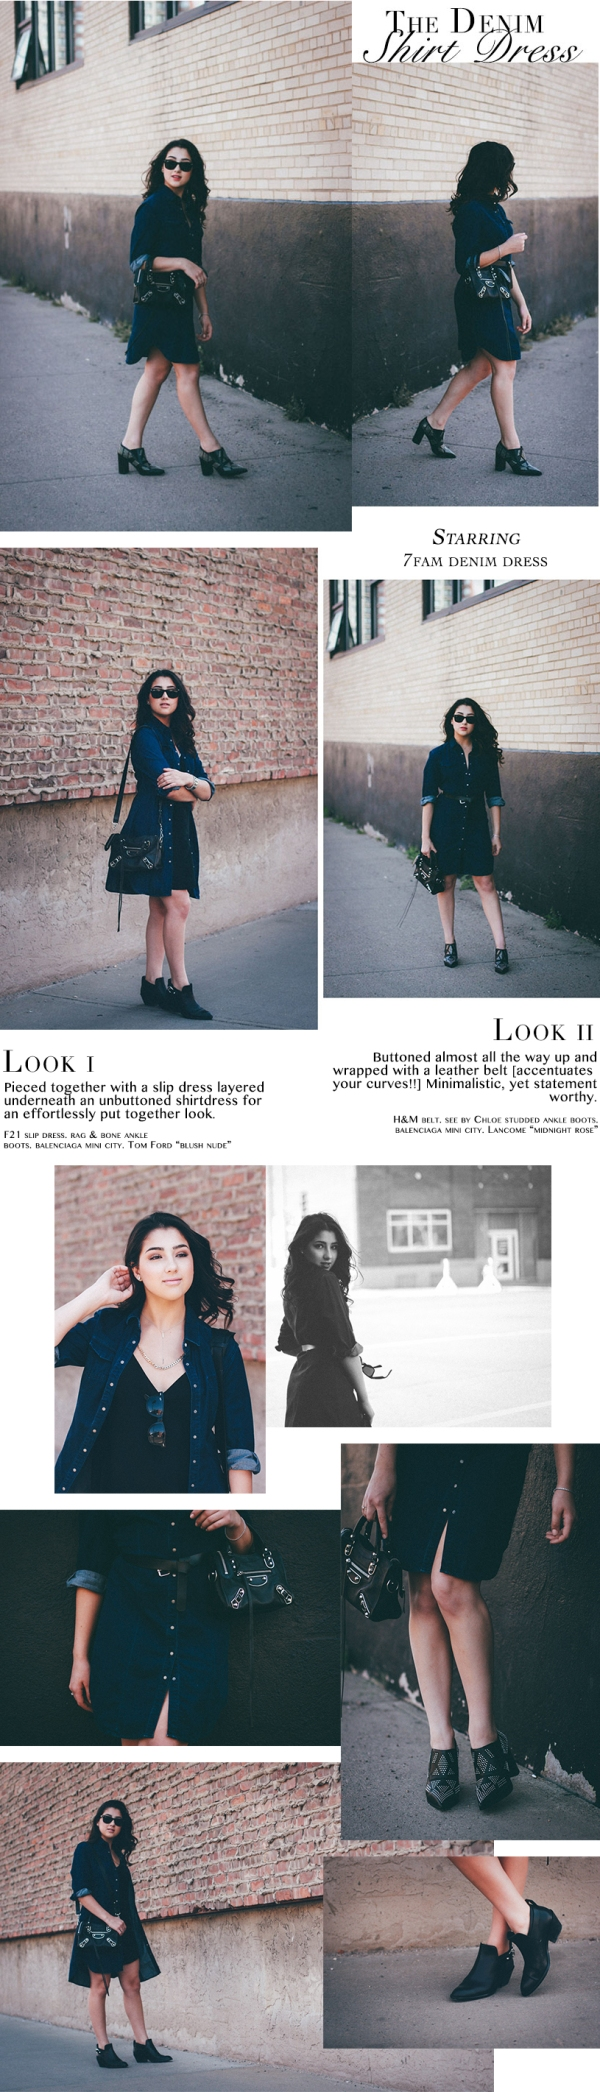 denim_shirt_dress1